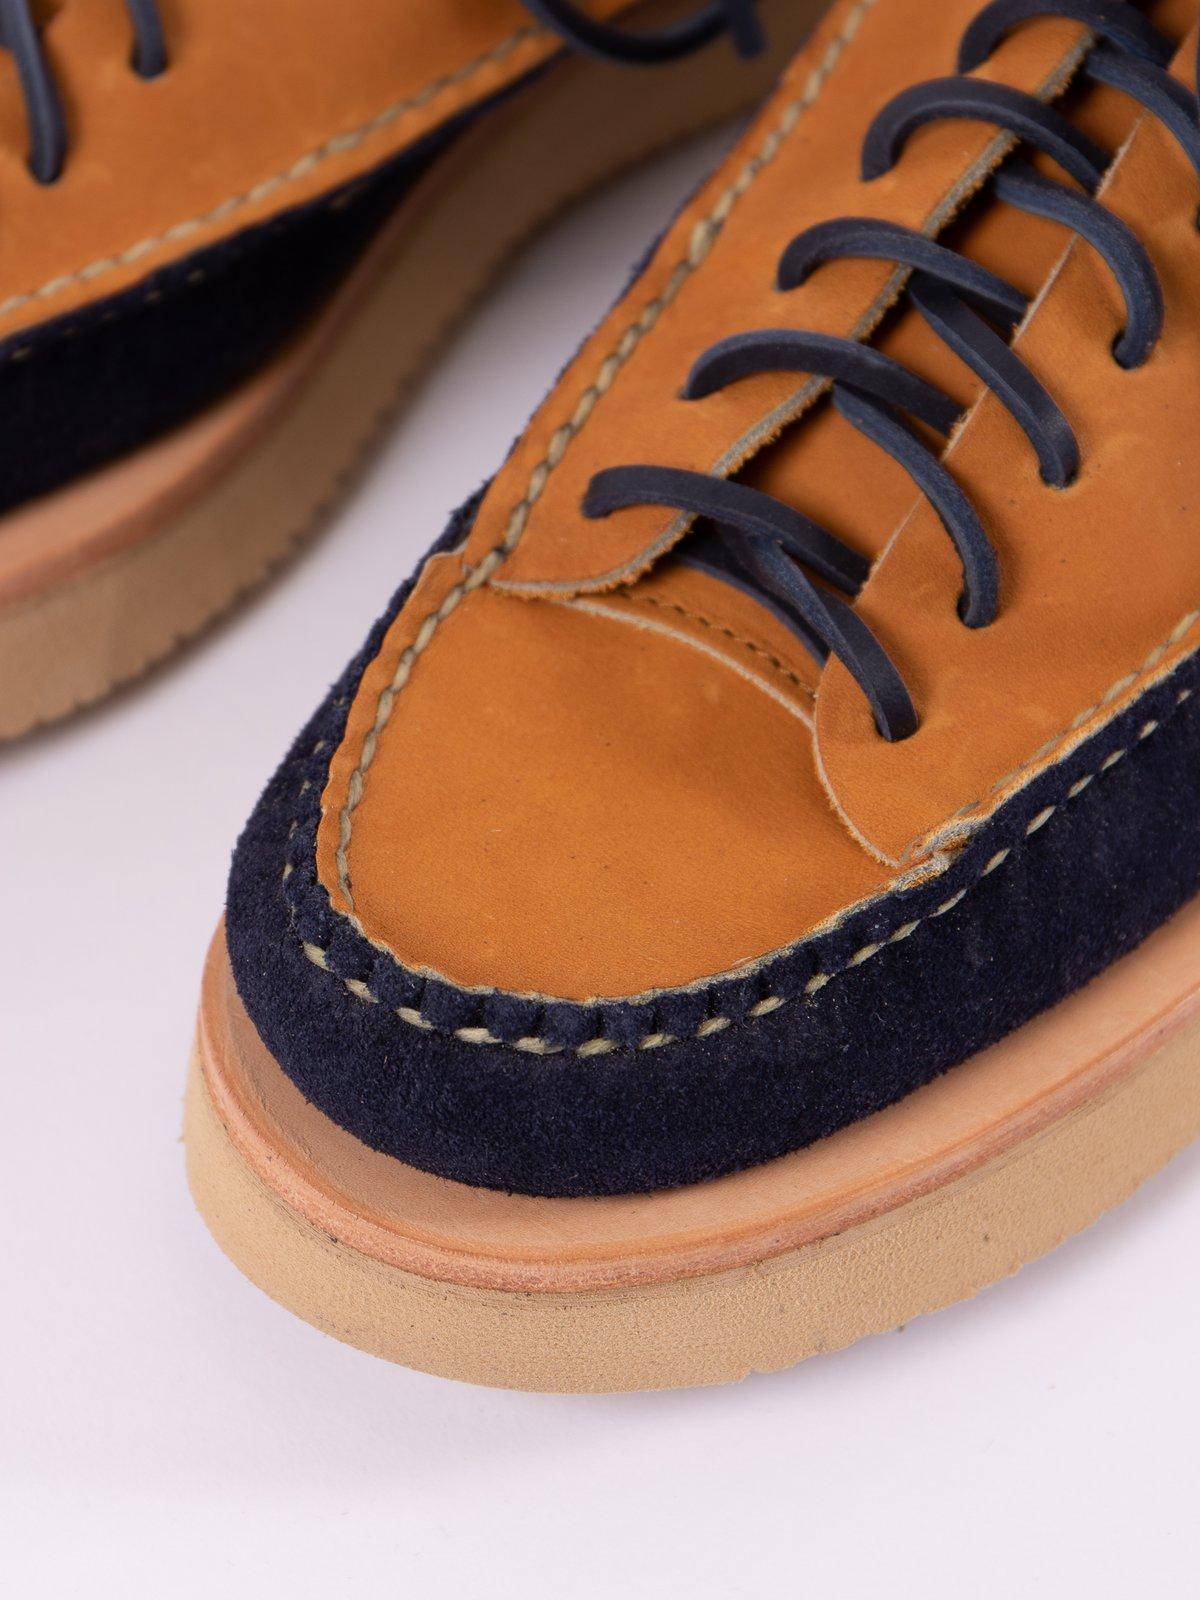 Indigo/Tan All Handsewn Sneaker Moc Ox Exclusive - Image 3